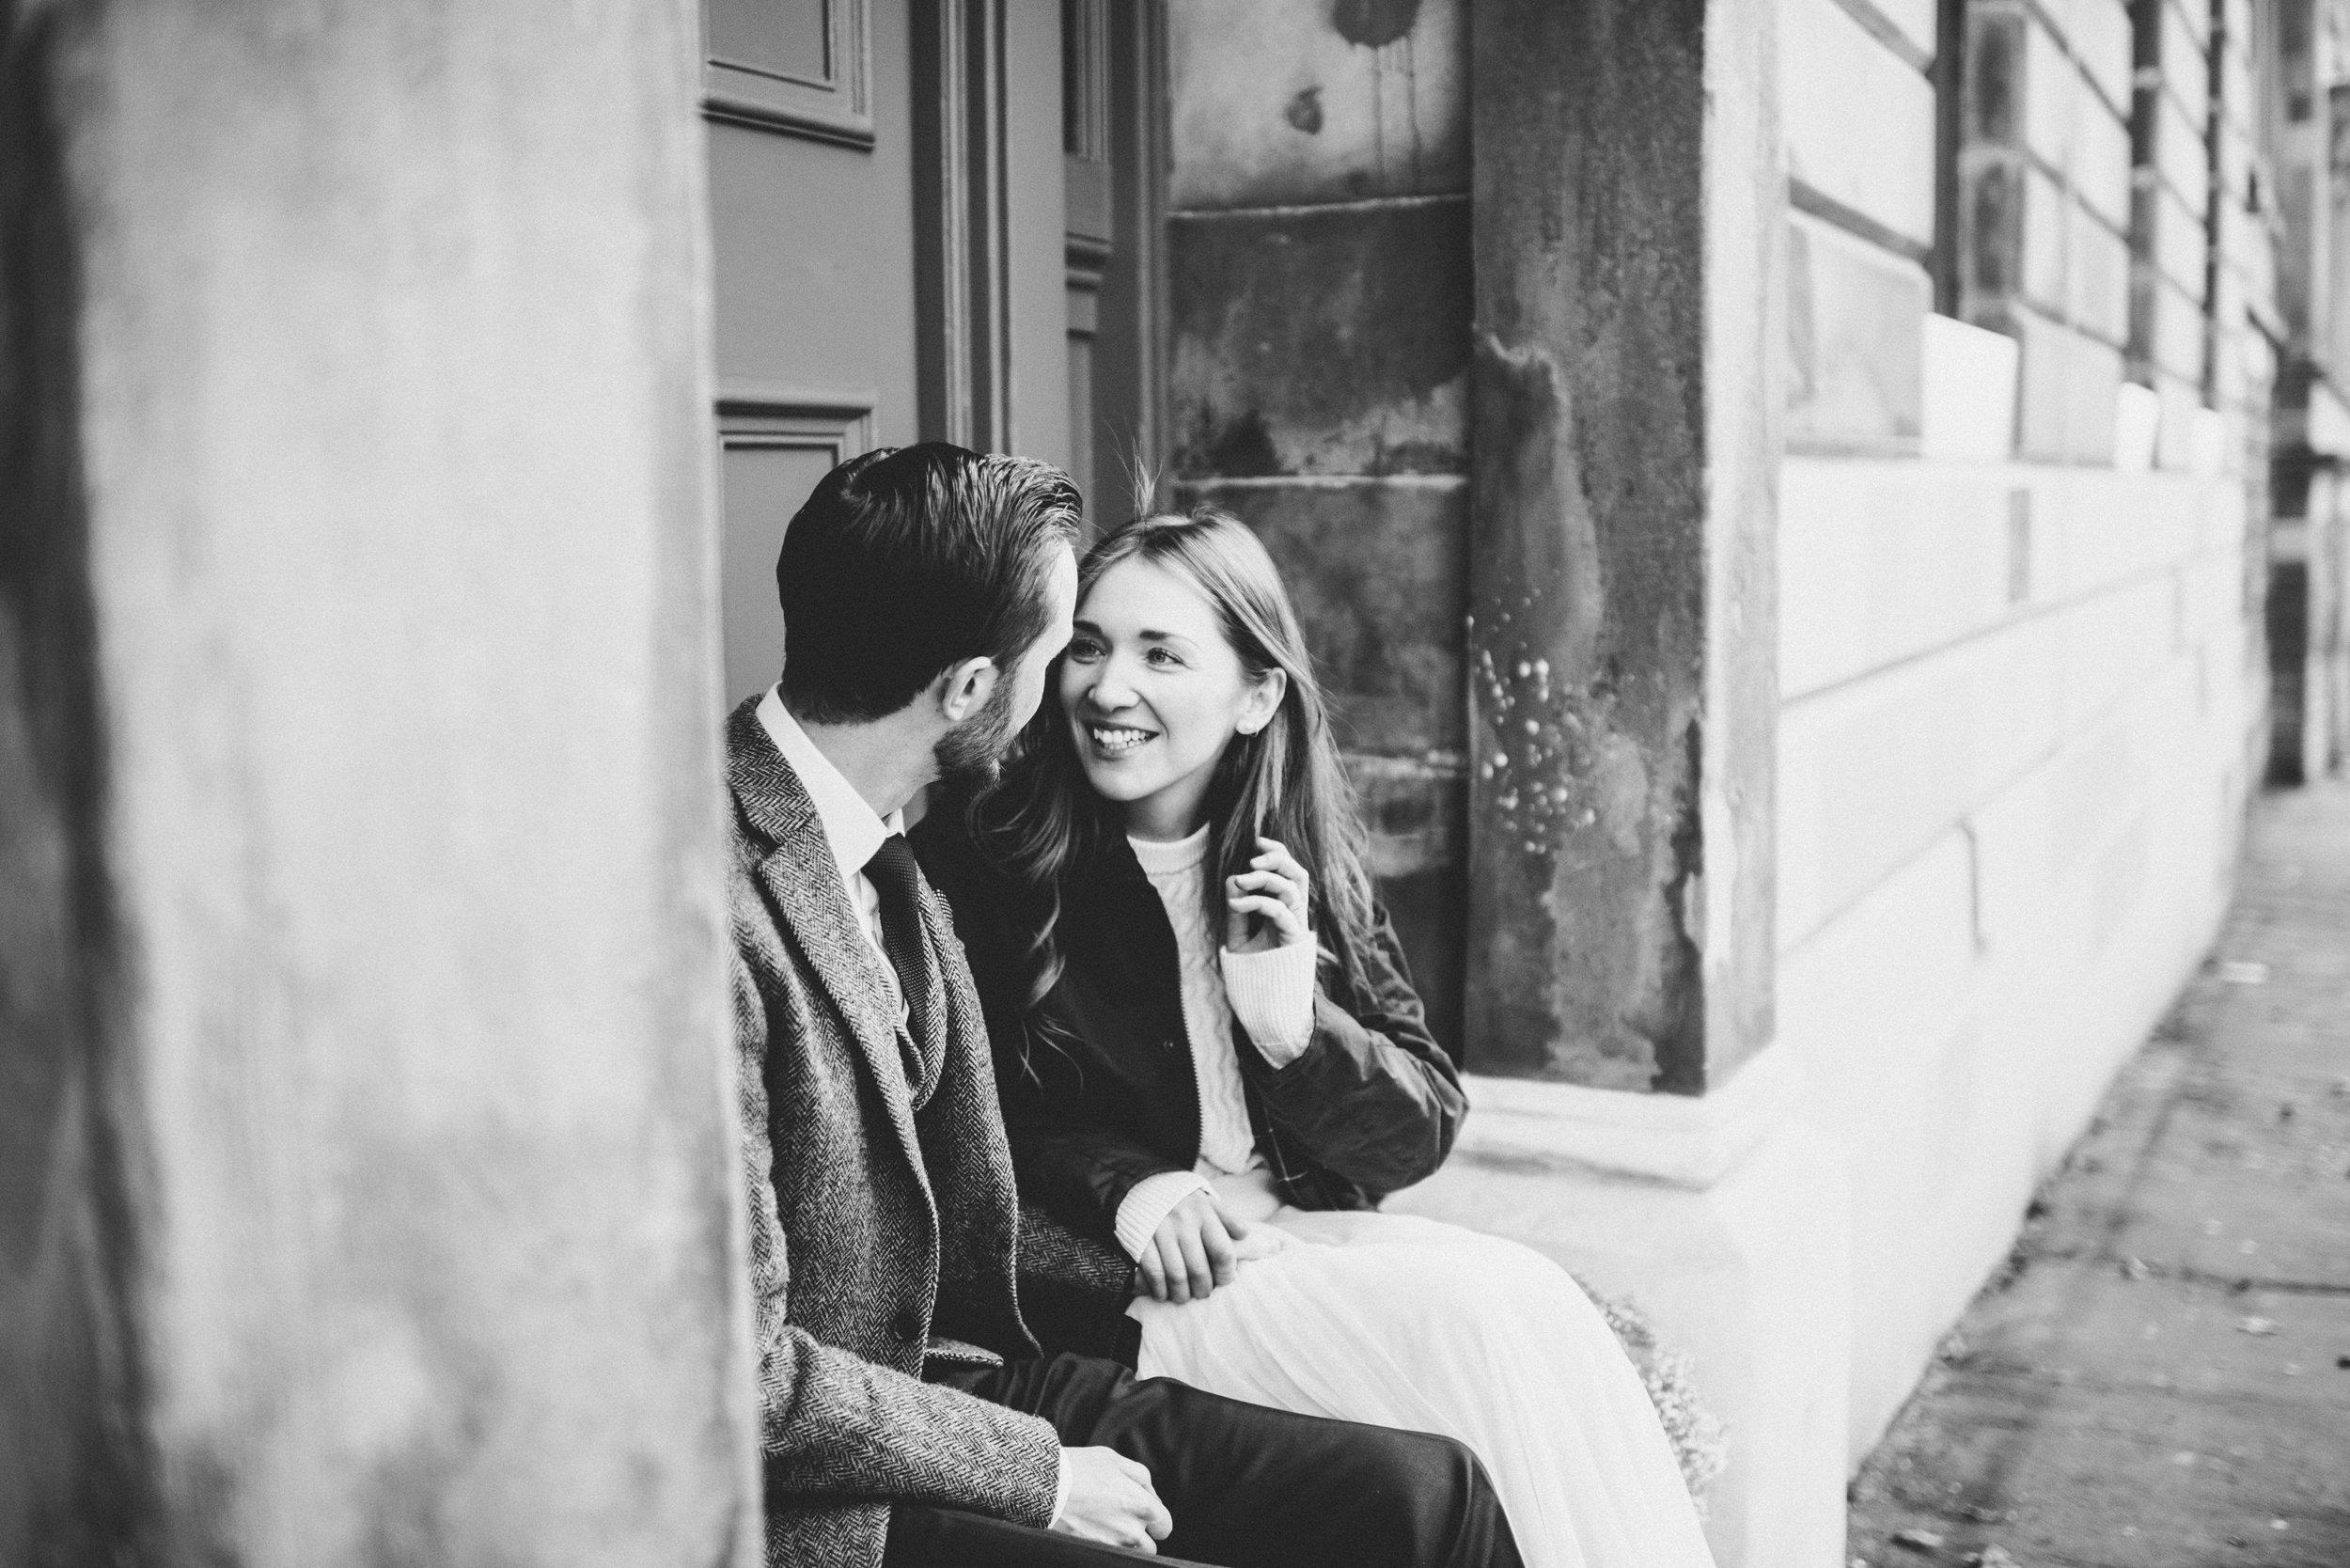 0113-LISA-DEVINE-PHOTOGRAPHY-ALTERNATIVE-WEDDING-PHOTOGRAPHY-SCOTLAND-DESTINATION-WEDDINGS-GLASGOW-WEDDINGS-COOL-WEDDINGS-STYLISH-WEDDINGS.JPG